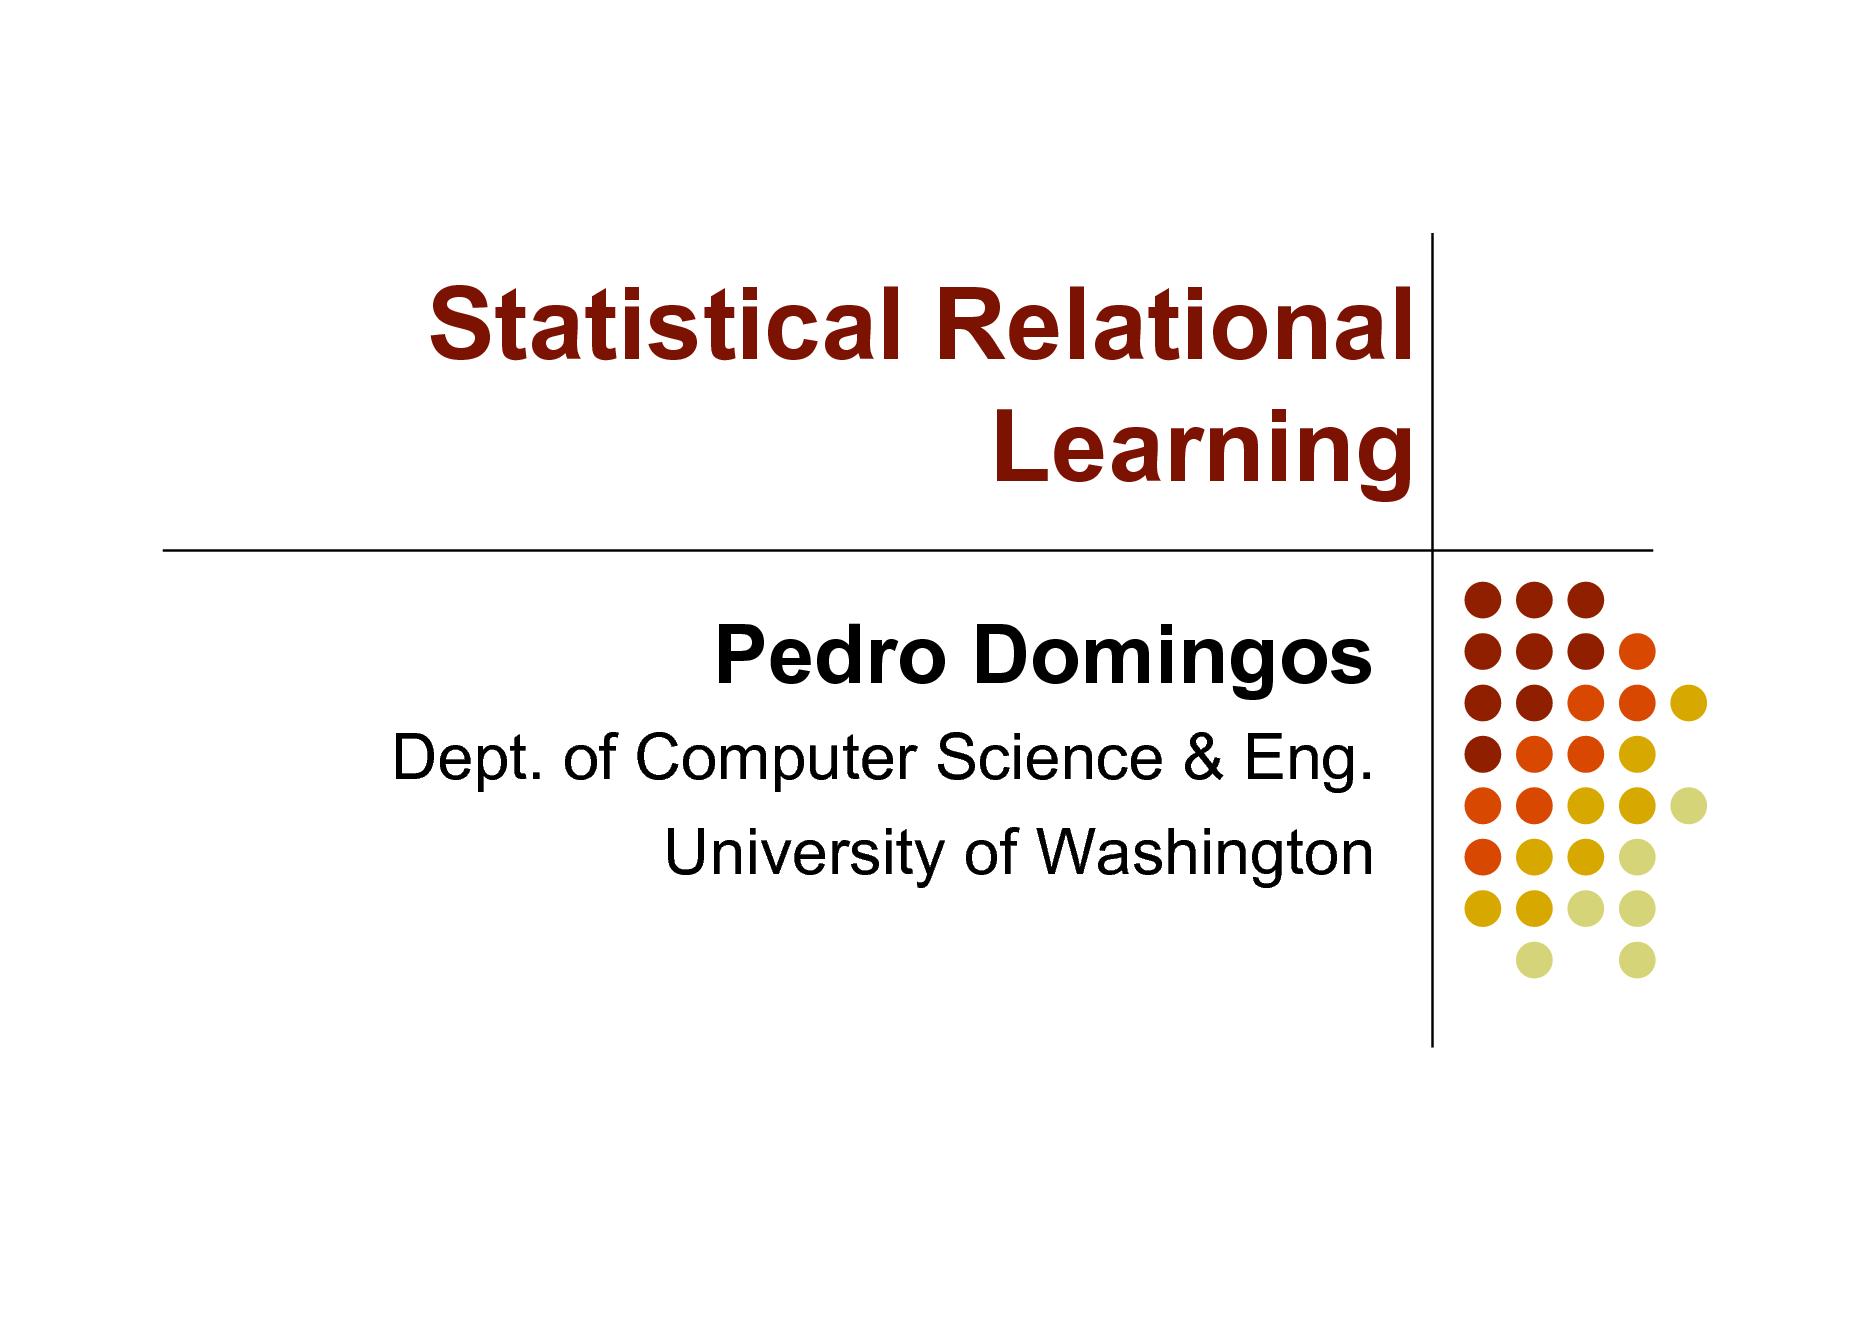 Slide: Statistical Relational Learning Pedro Domingos Dept. of Computer Science & Eng. University of Washington